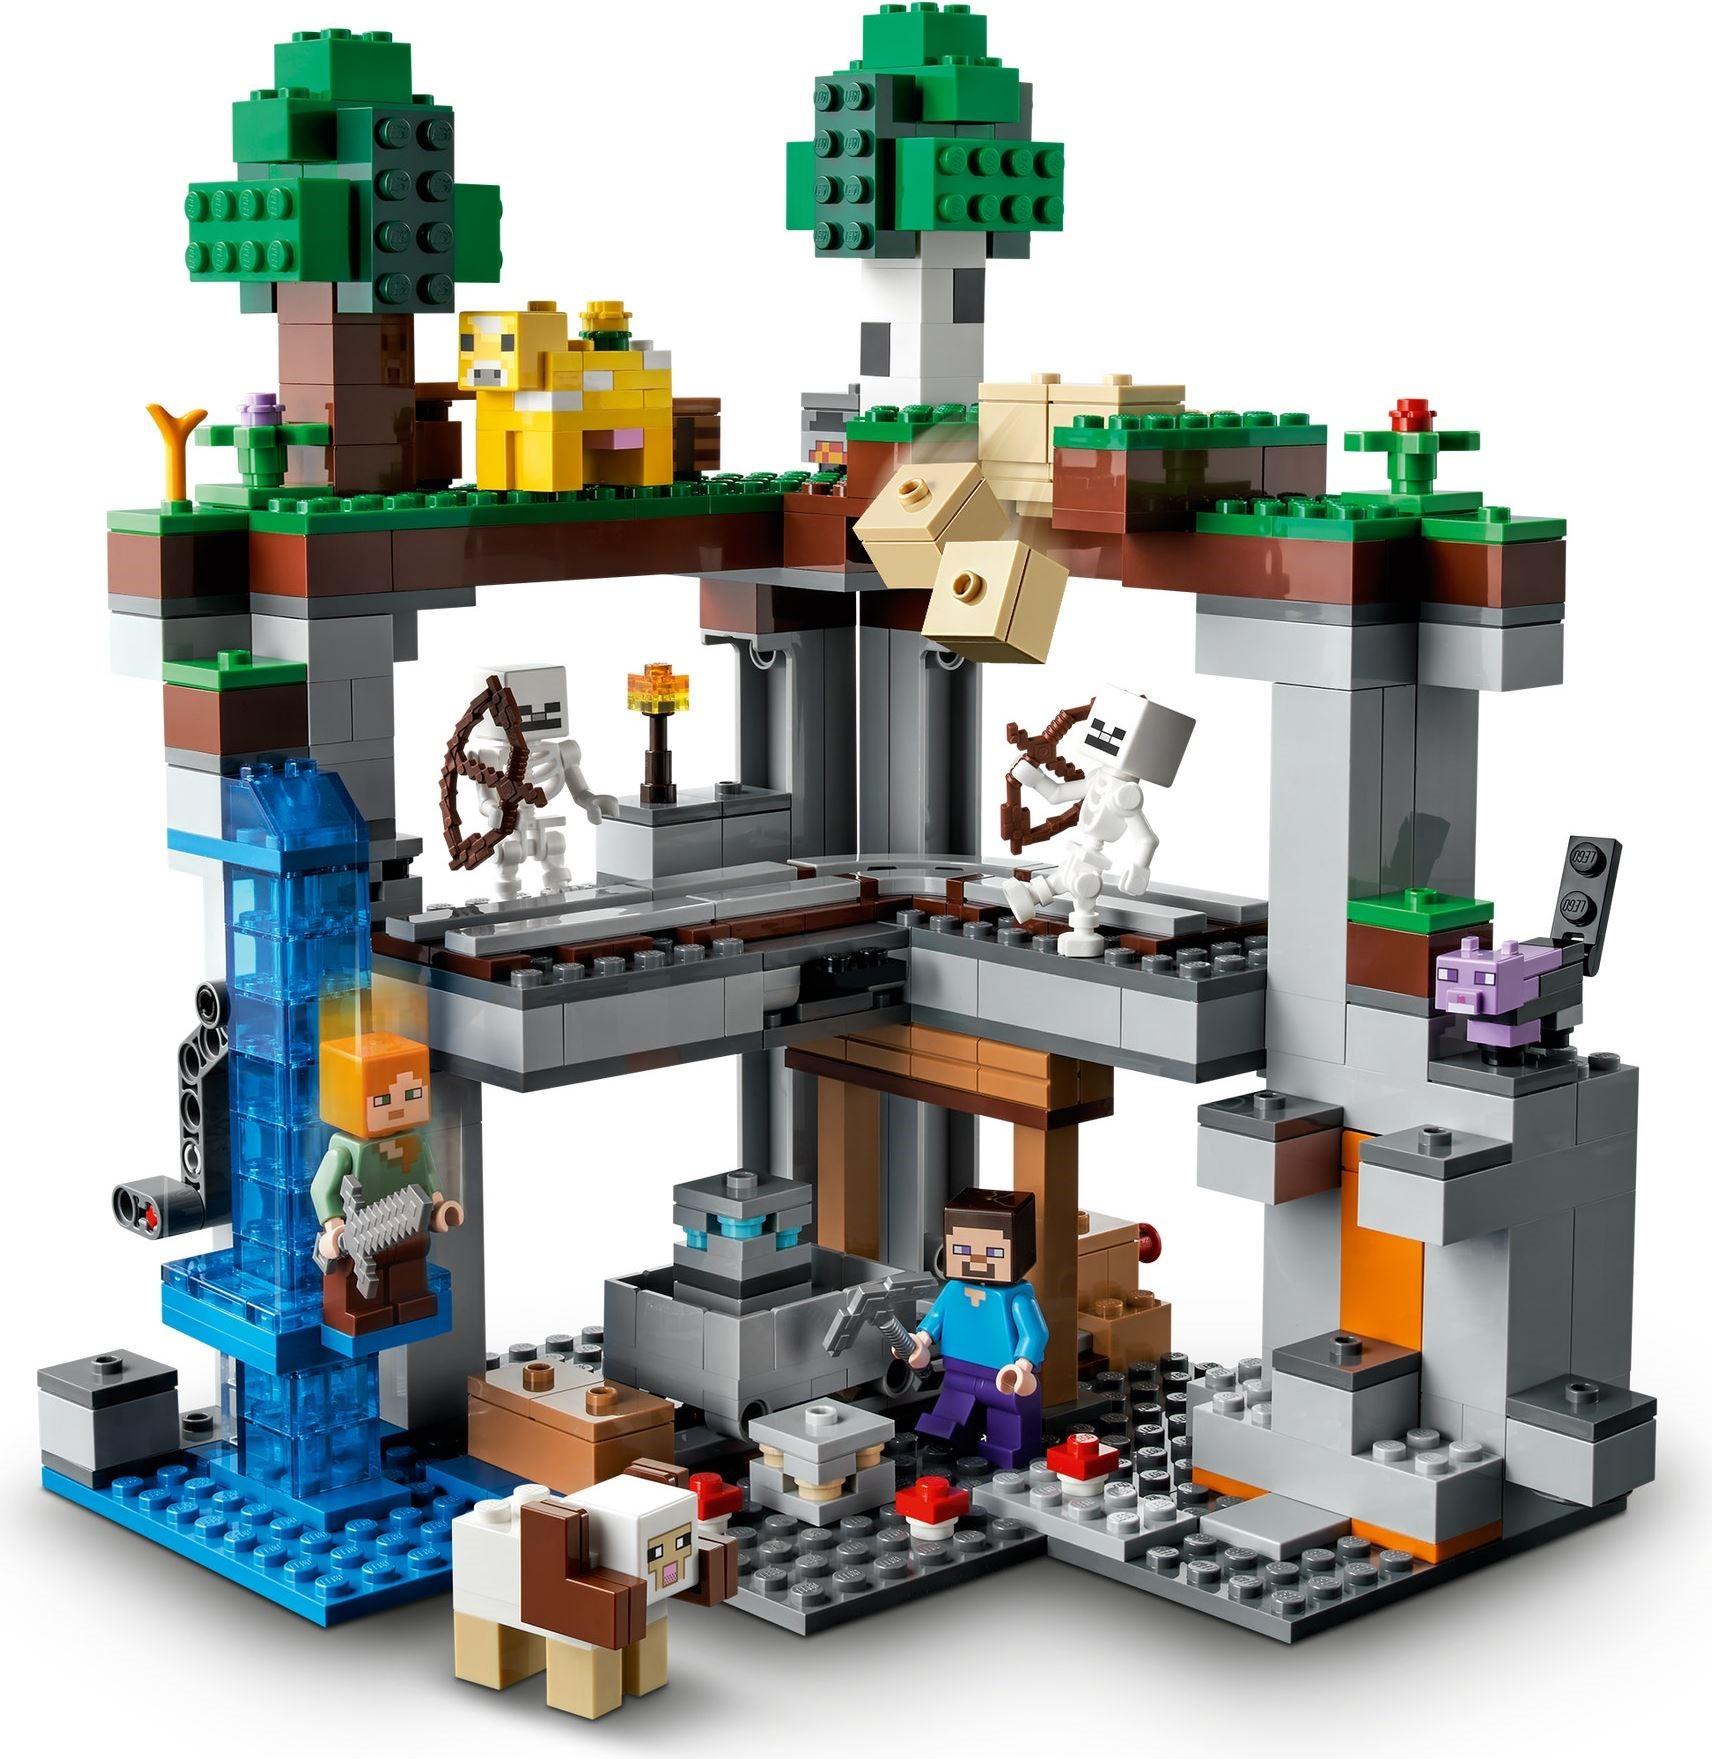 Огляд набору Lego Minecraft 21169 The First Adventure